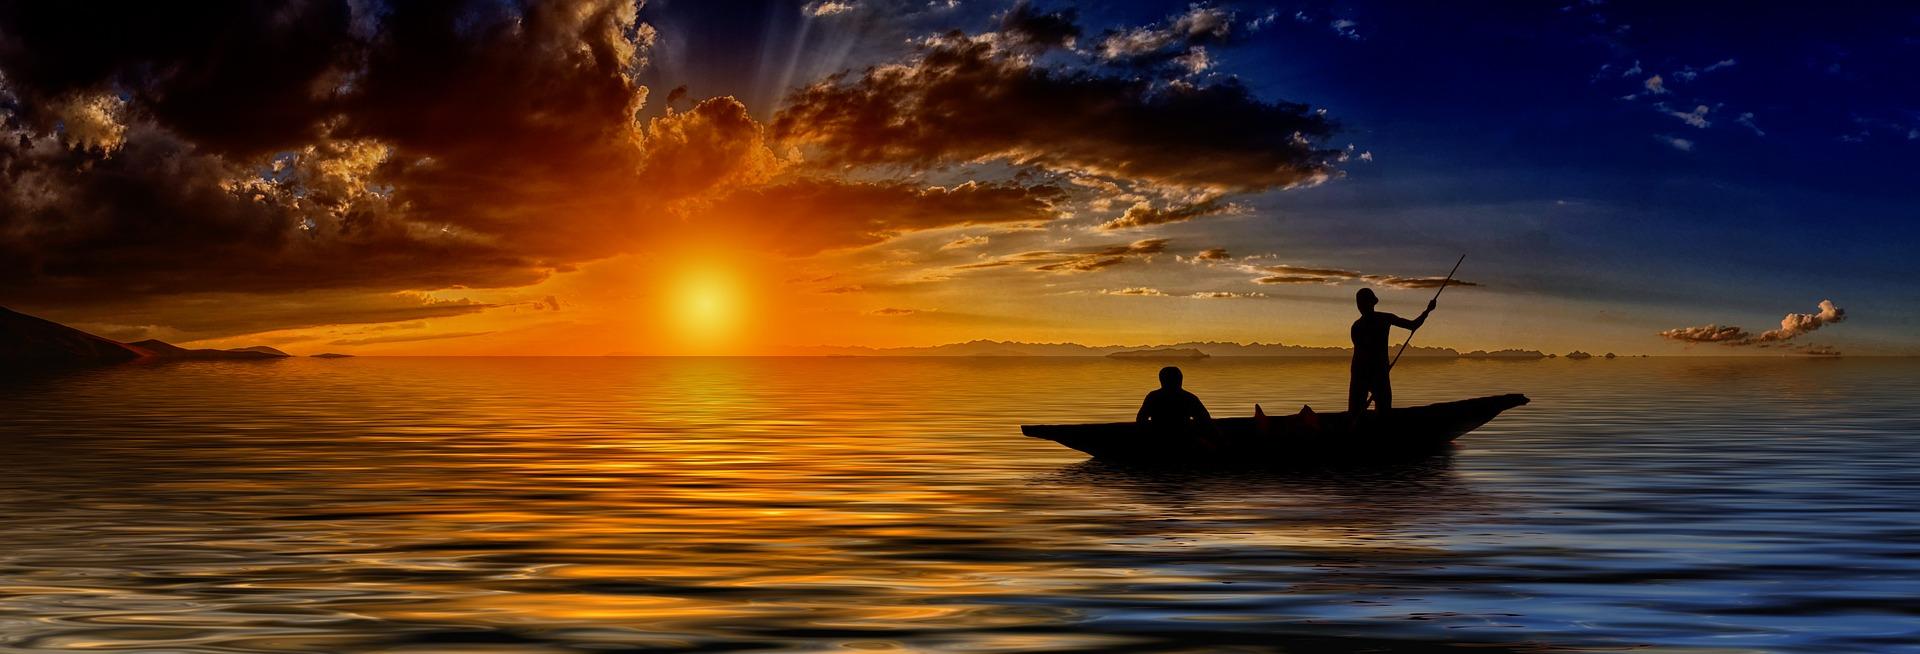 sunset-3454964_1920